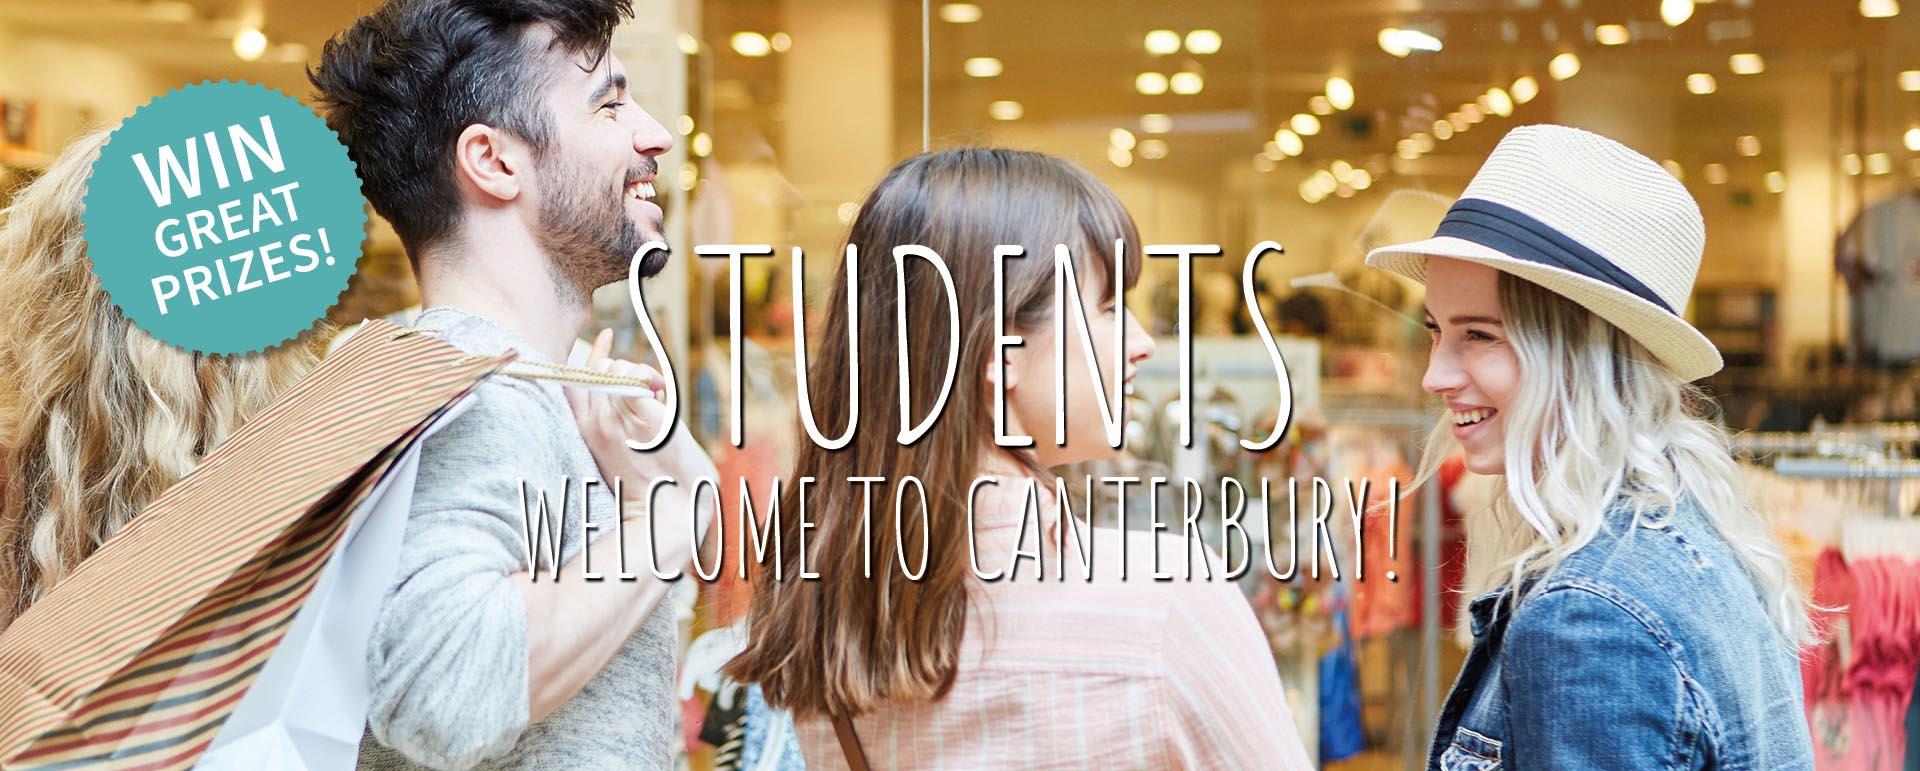 Canterbury's Student Shopping Week